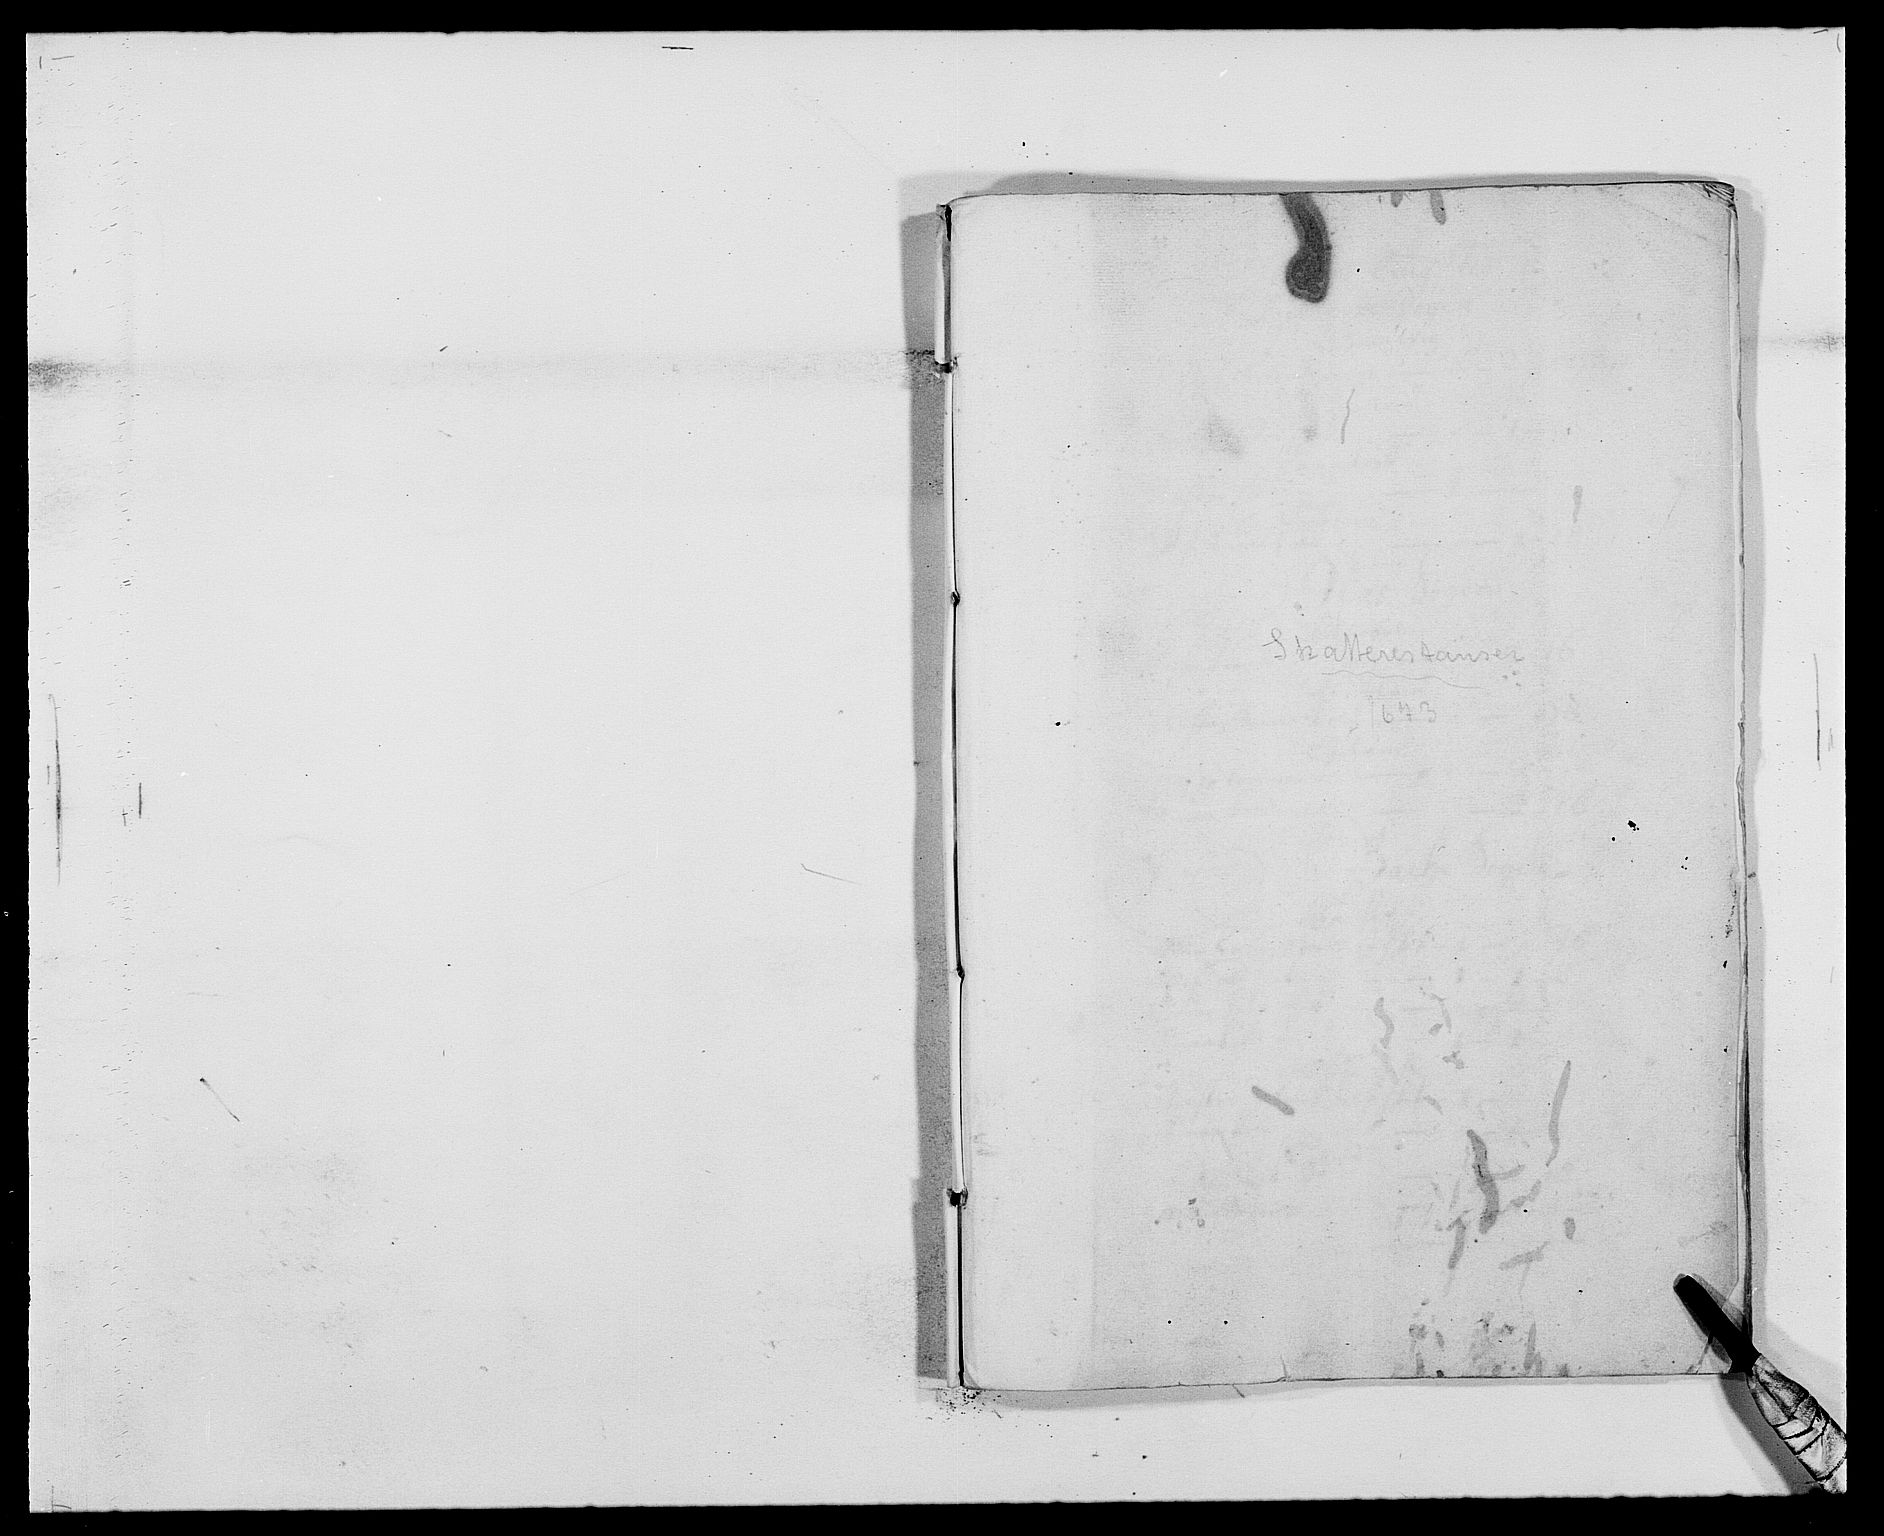 RA, Rentekammeret inntil 1814, Reviderte regnskaper, Fogderegnskap, R41/L2528: Fogderegnskap Lista, 1673-1674, s. 162